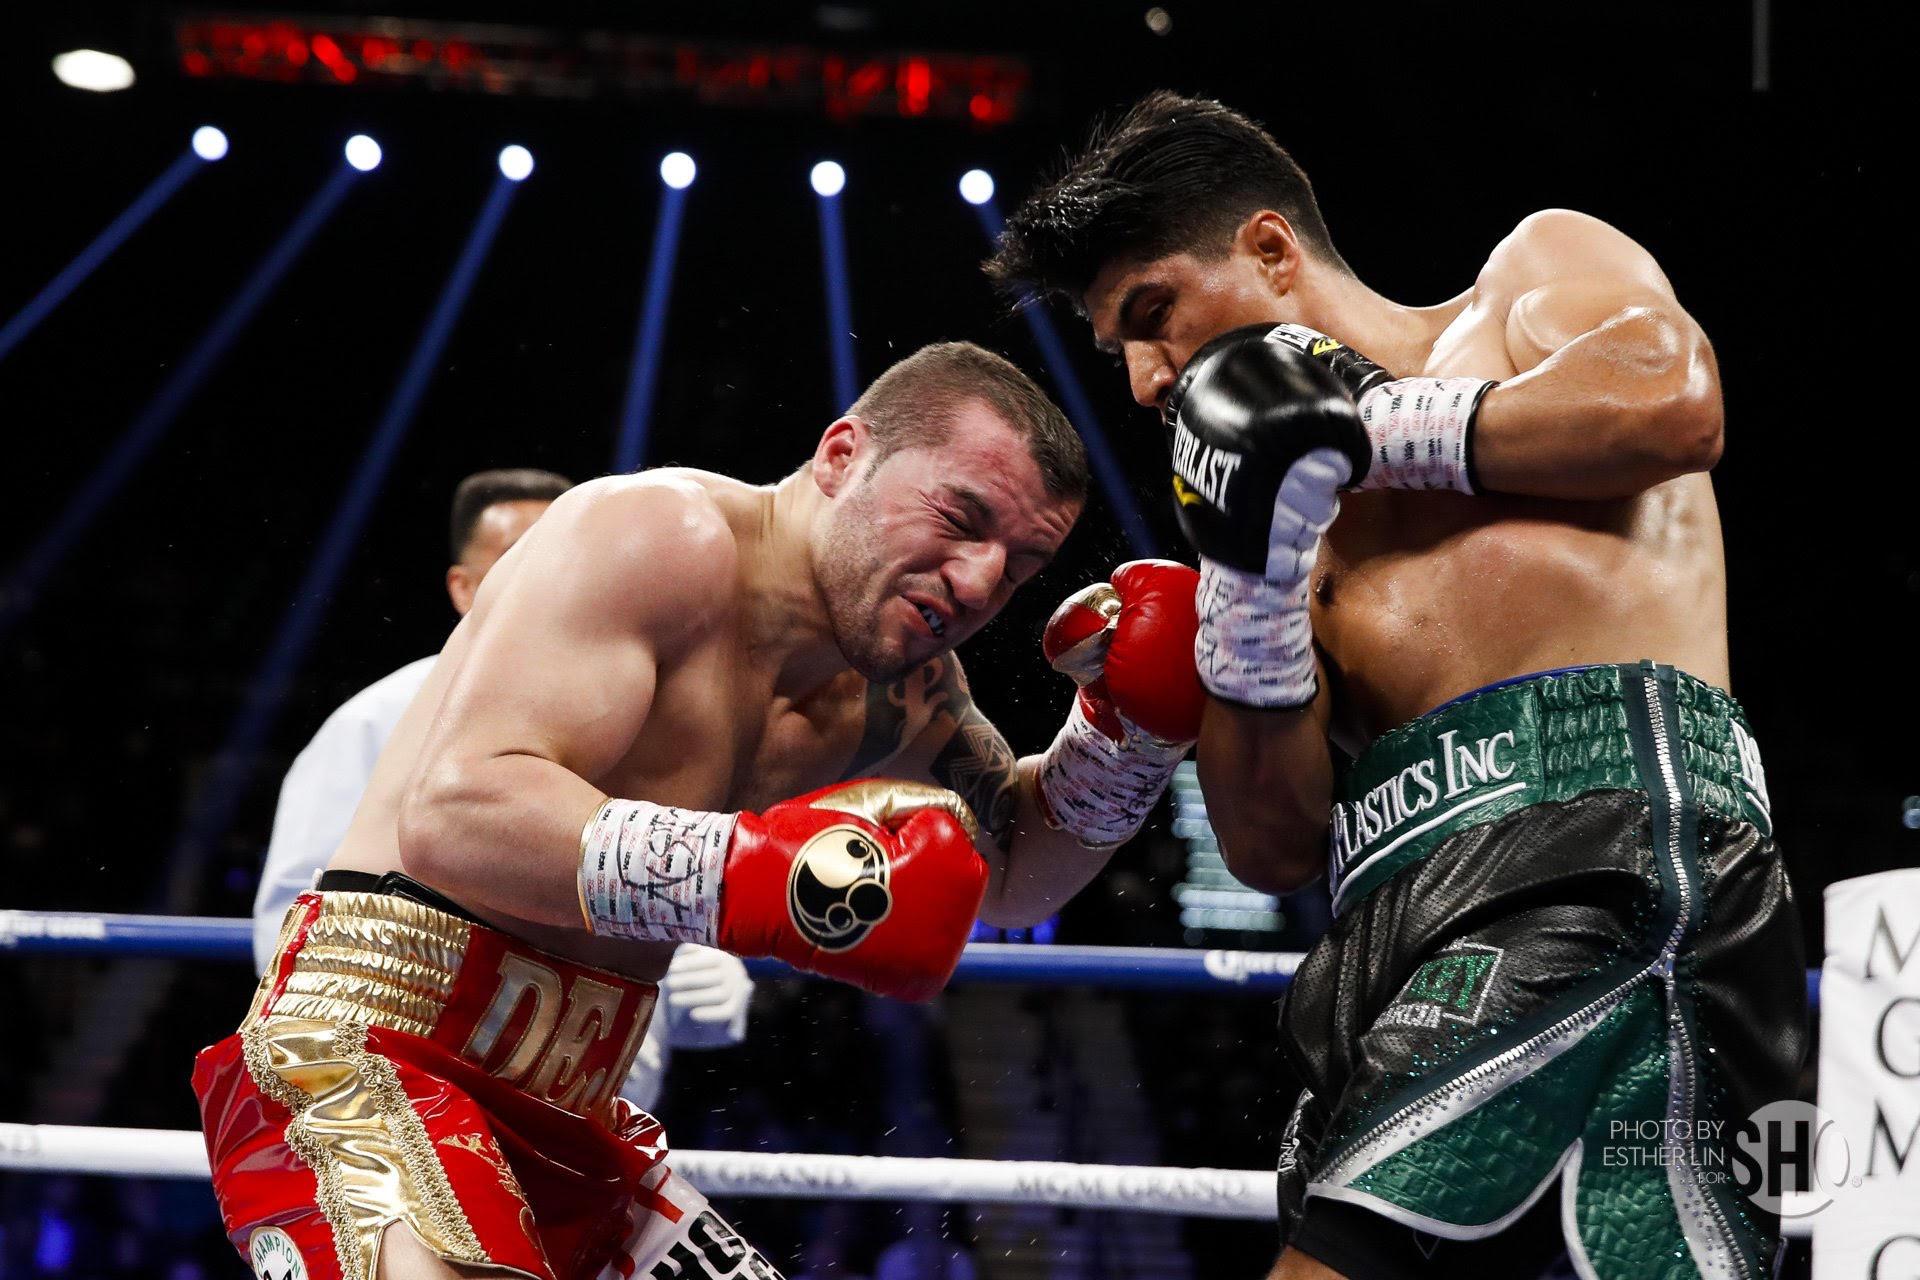 Mikey García vence por fulminante KO a Zlaticanin y se corona campeón